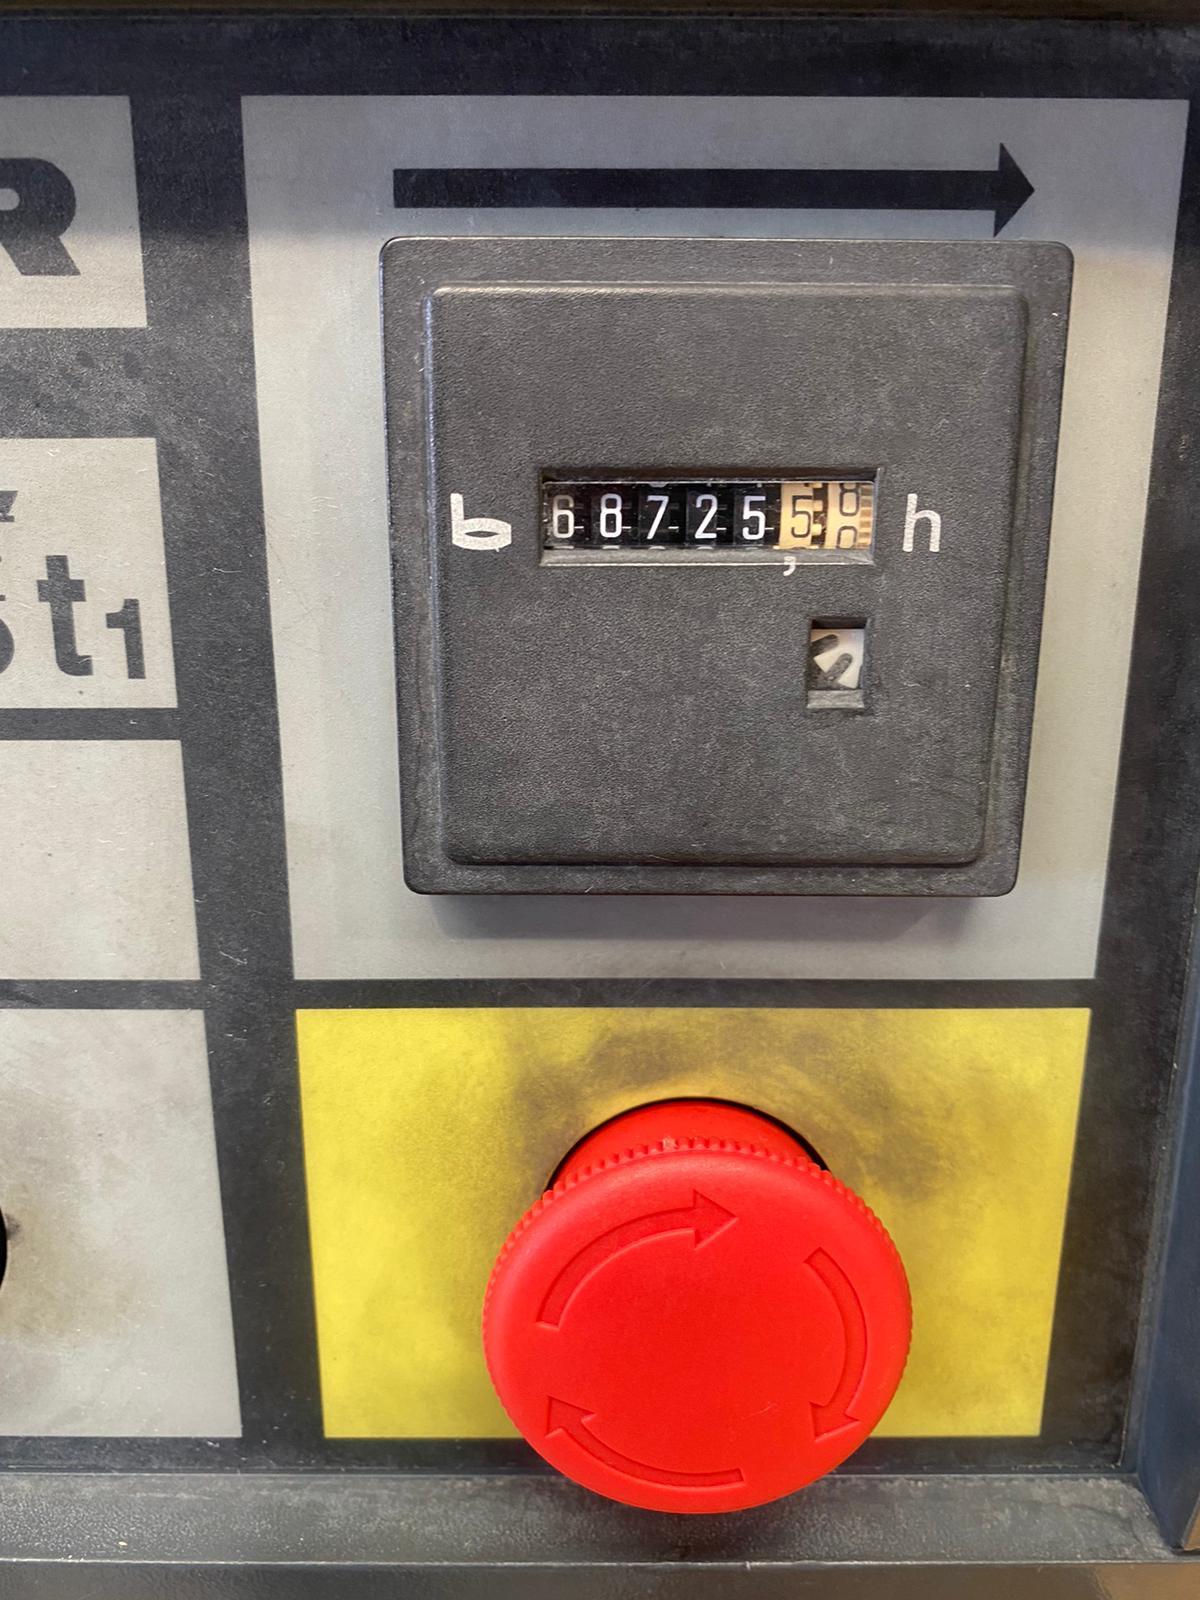 HPC AS36 22Kw Industrial Screw Compressor 7.5 BAR 122 CFM